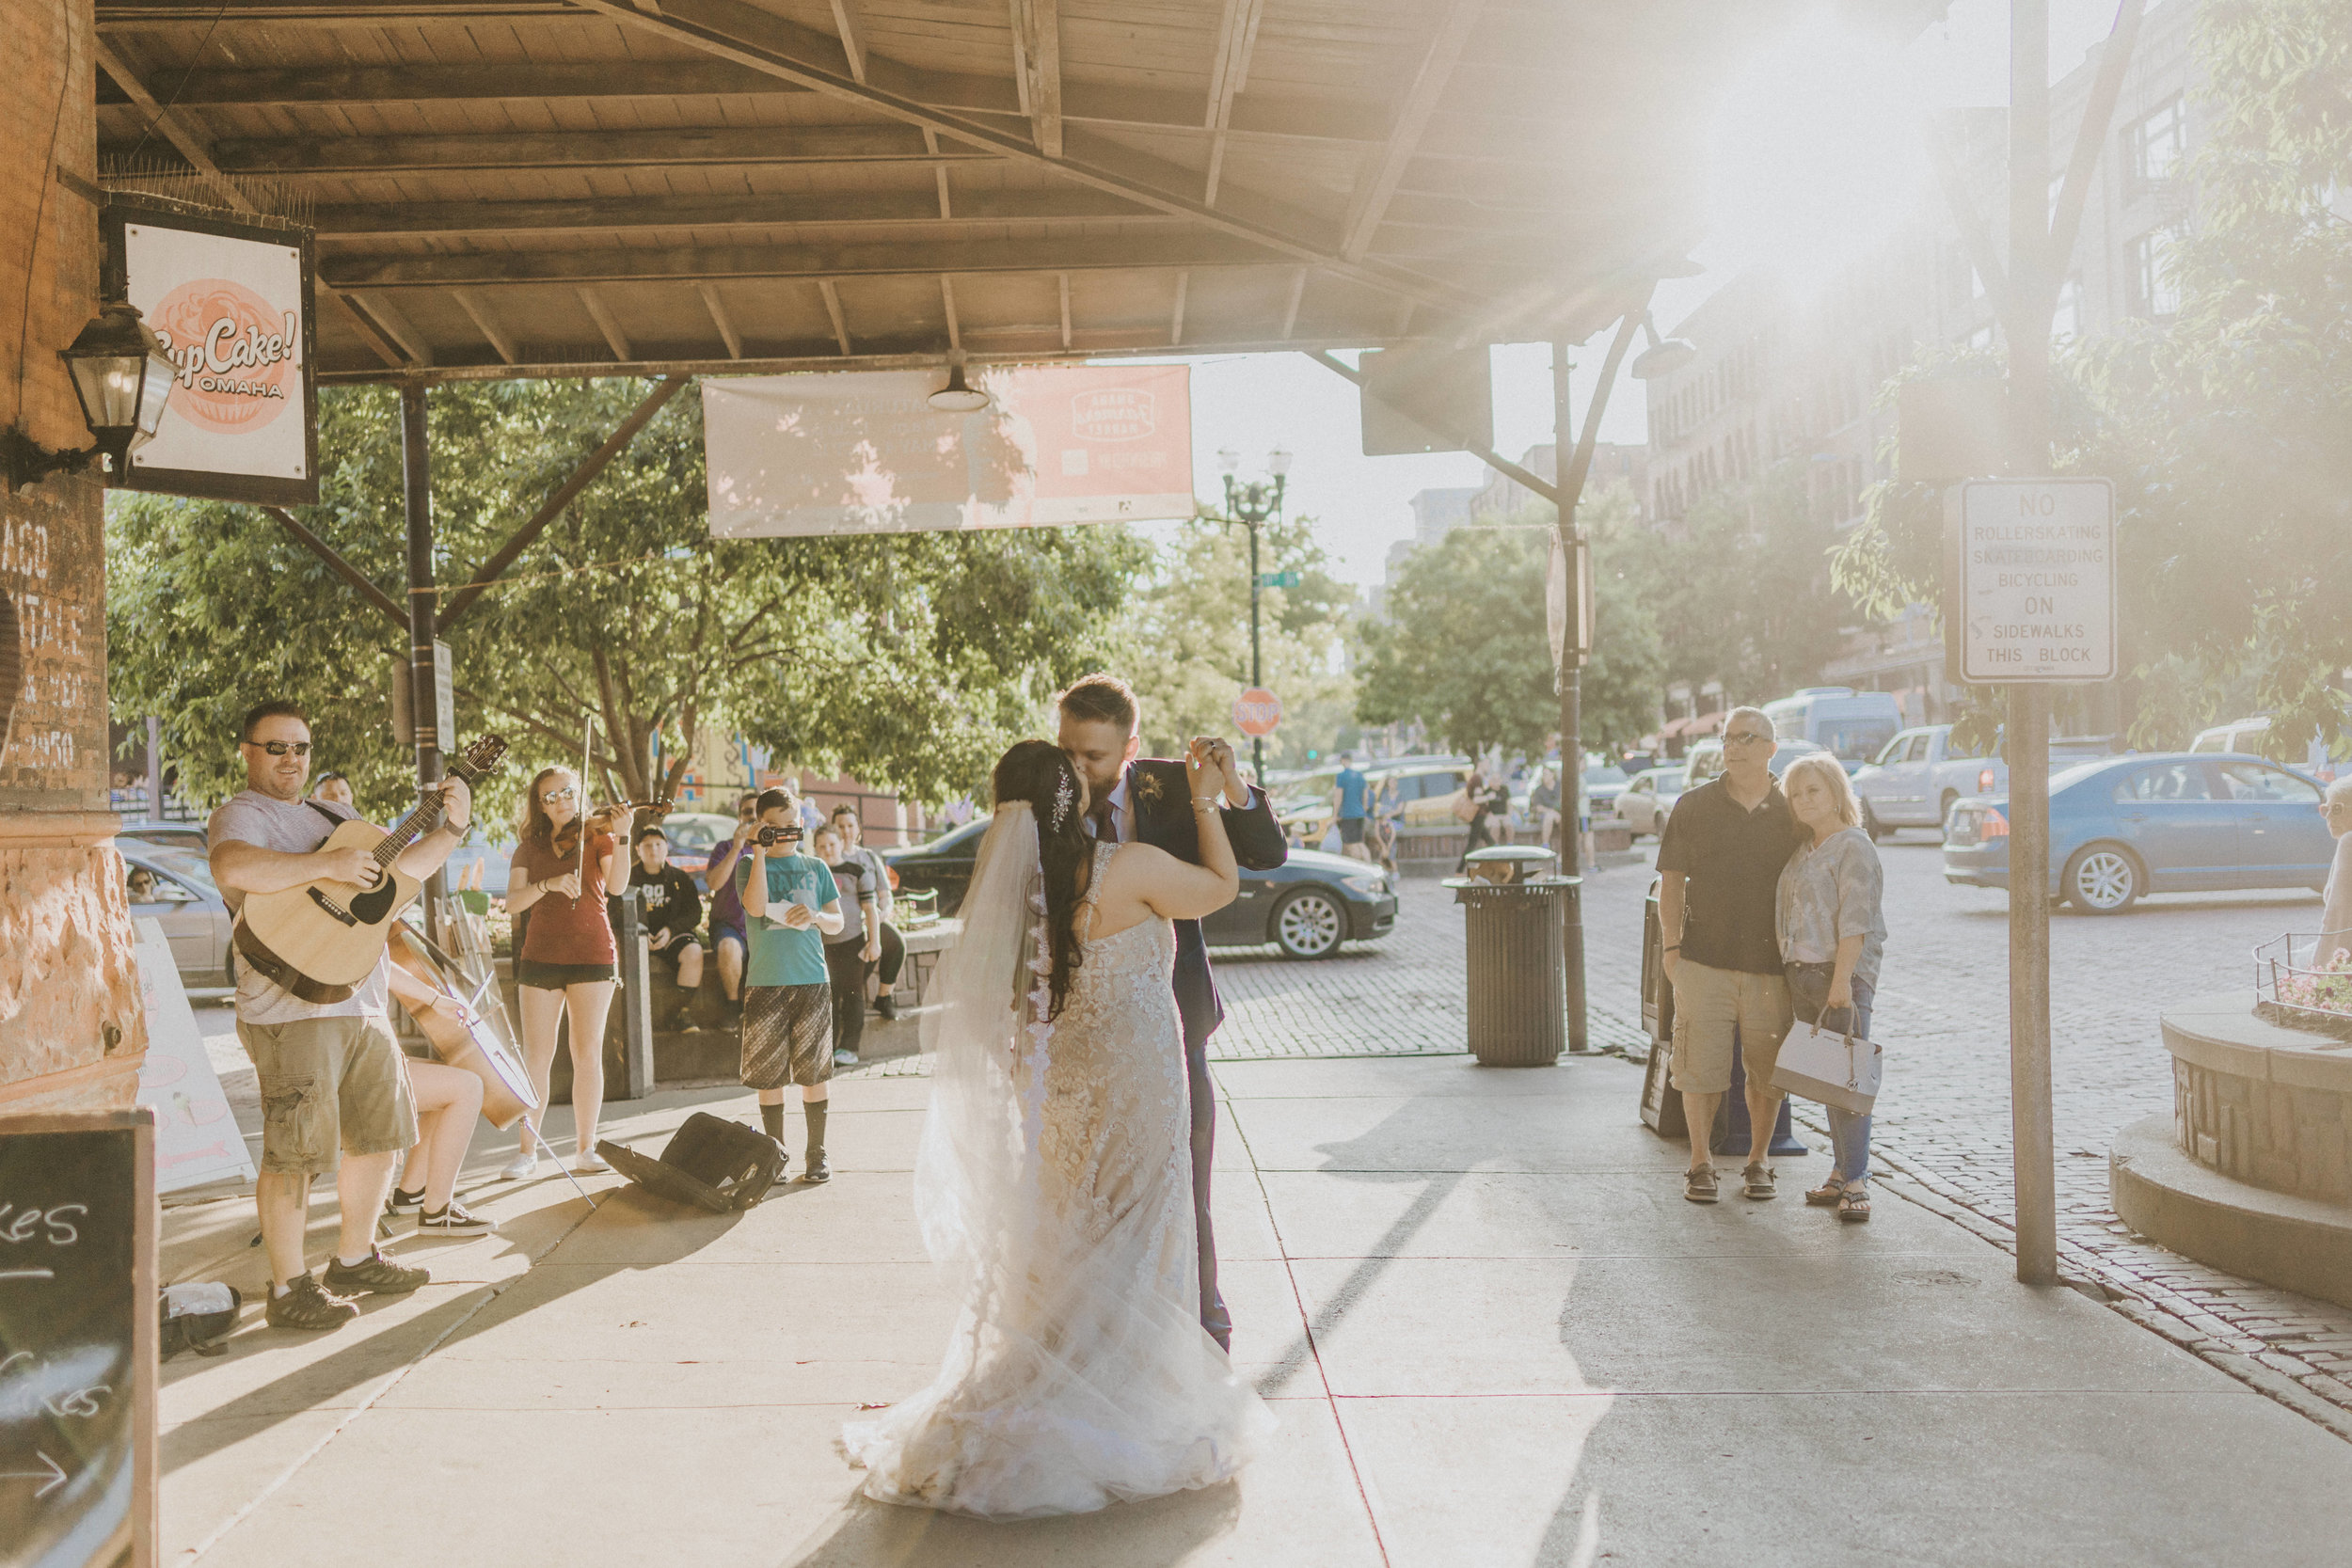 166 tiny-luxe-weddings-custom-elopement-summer-omaha-old-market.jpg